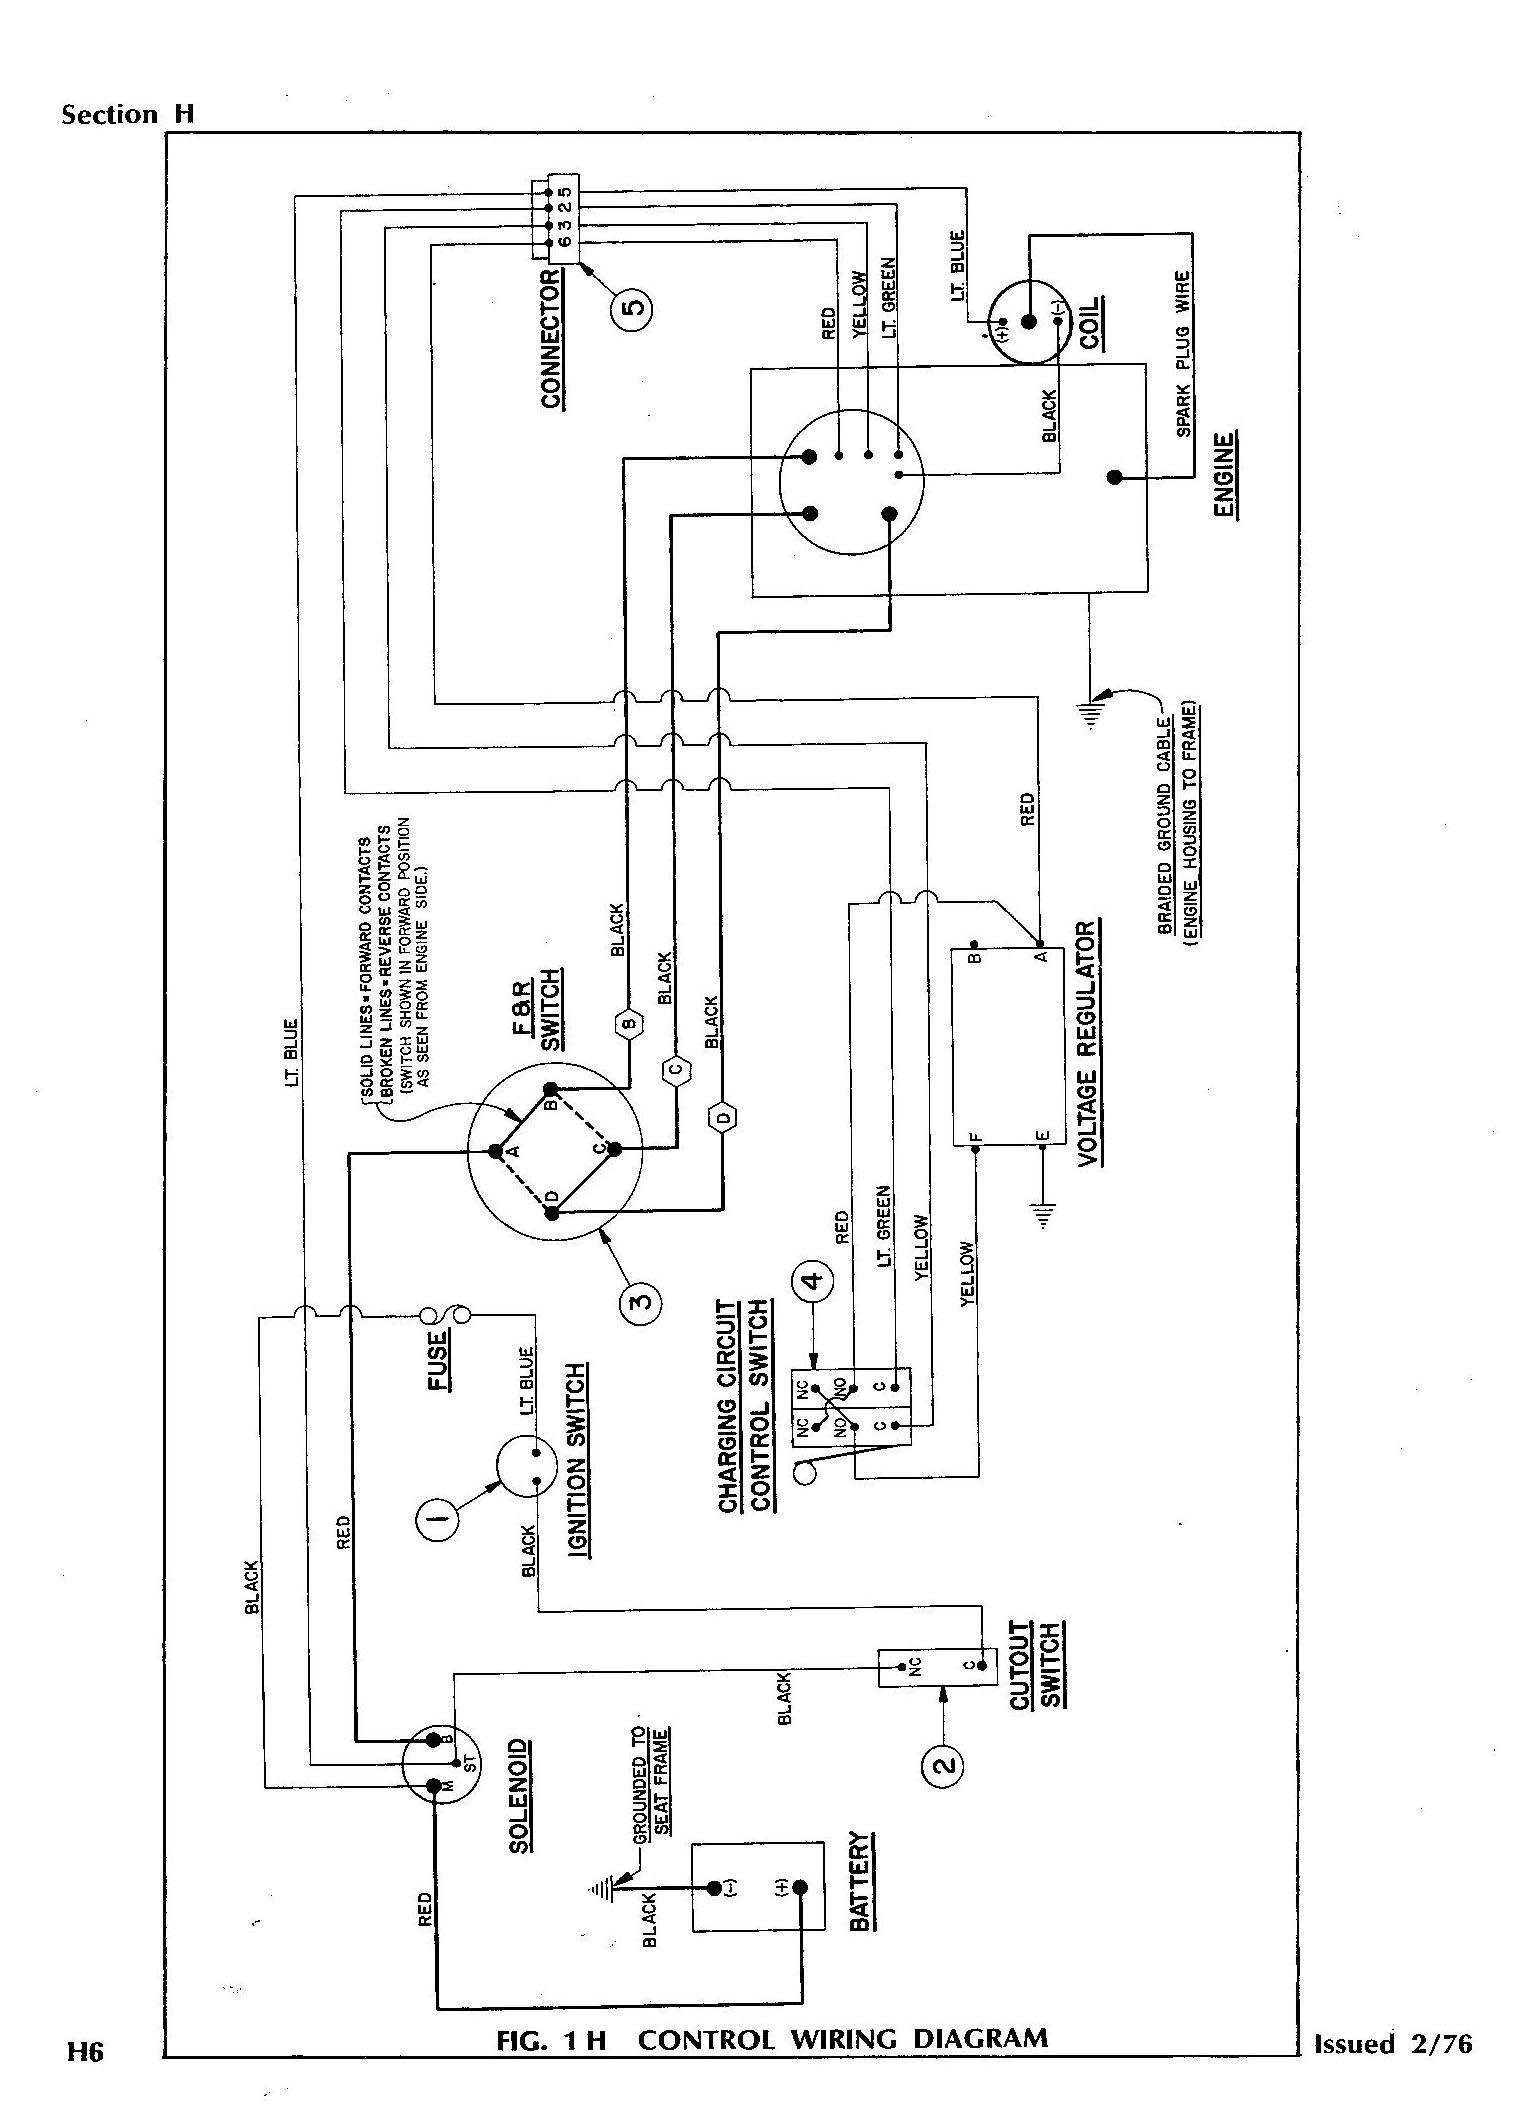 marketeer golf cart wiring diagram wiring schematic diagram  marketeer golf cart wiring diagram #9